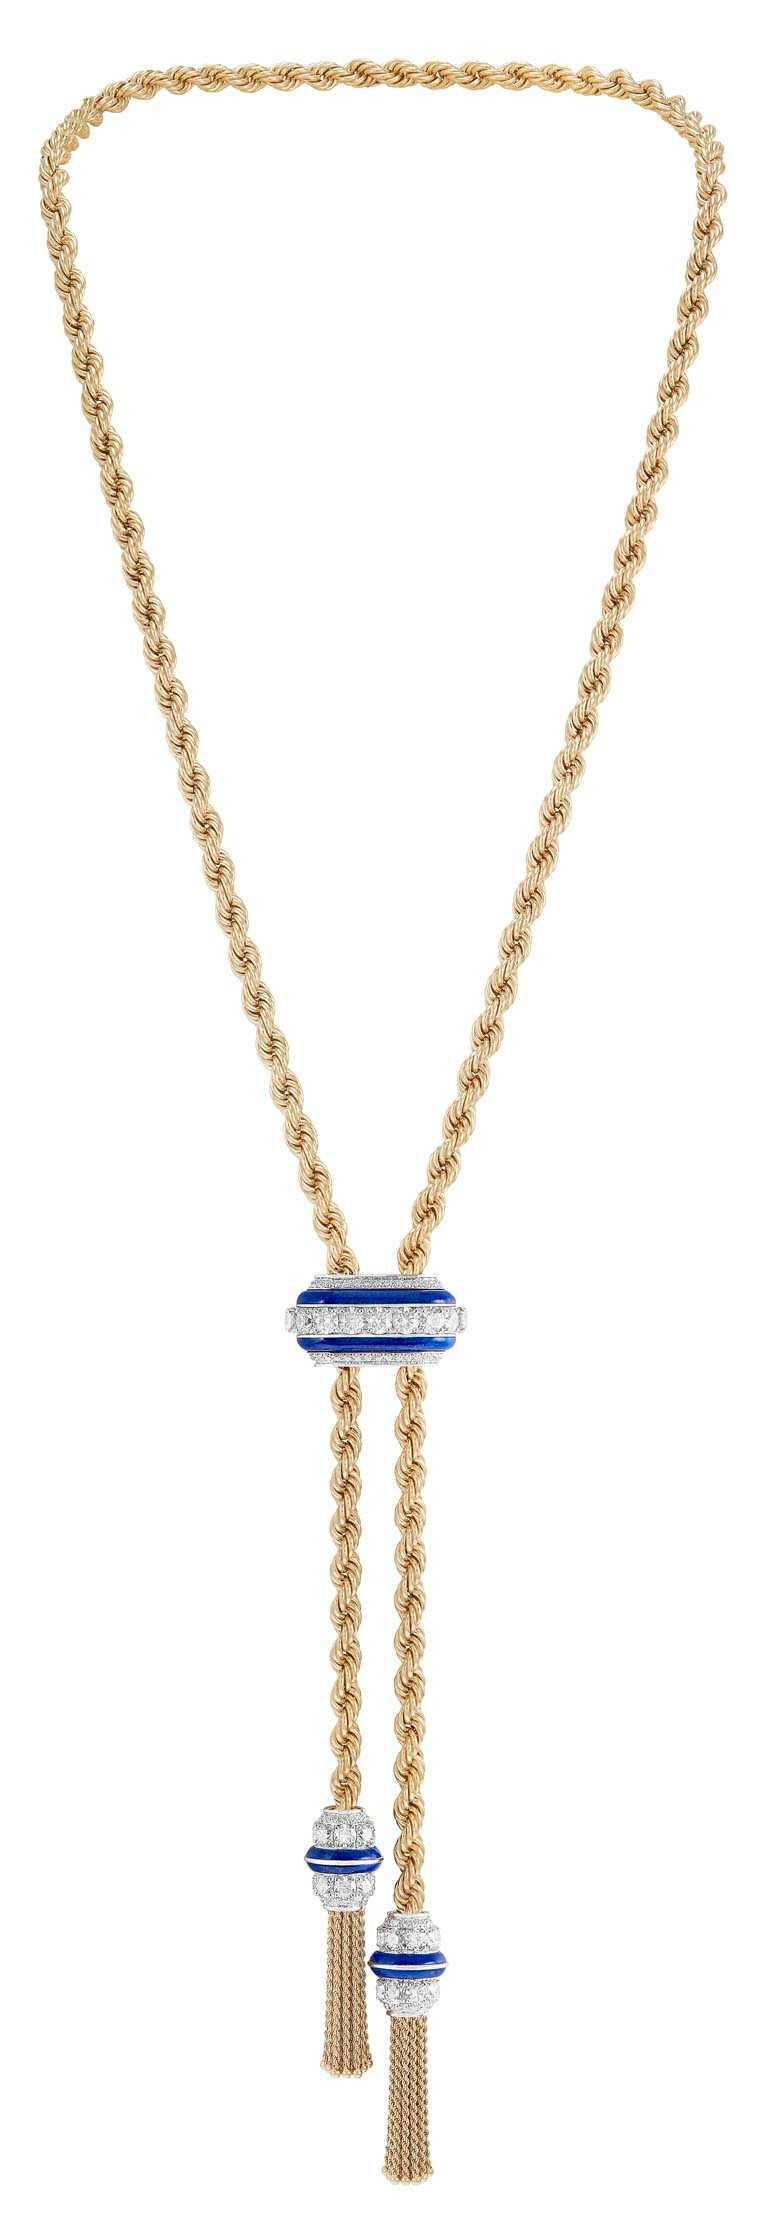 Van Cleef & Arpels「Liane」長項鍊,黃K金、白K金、青金石、鑽石。(圖╱Van Cleef & Arpels提供)